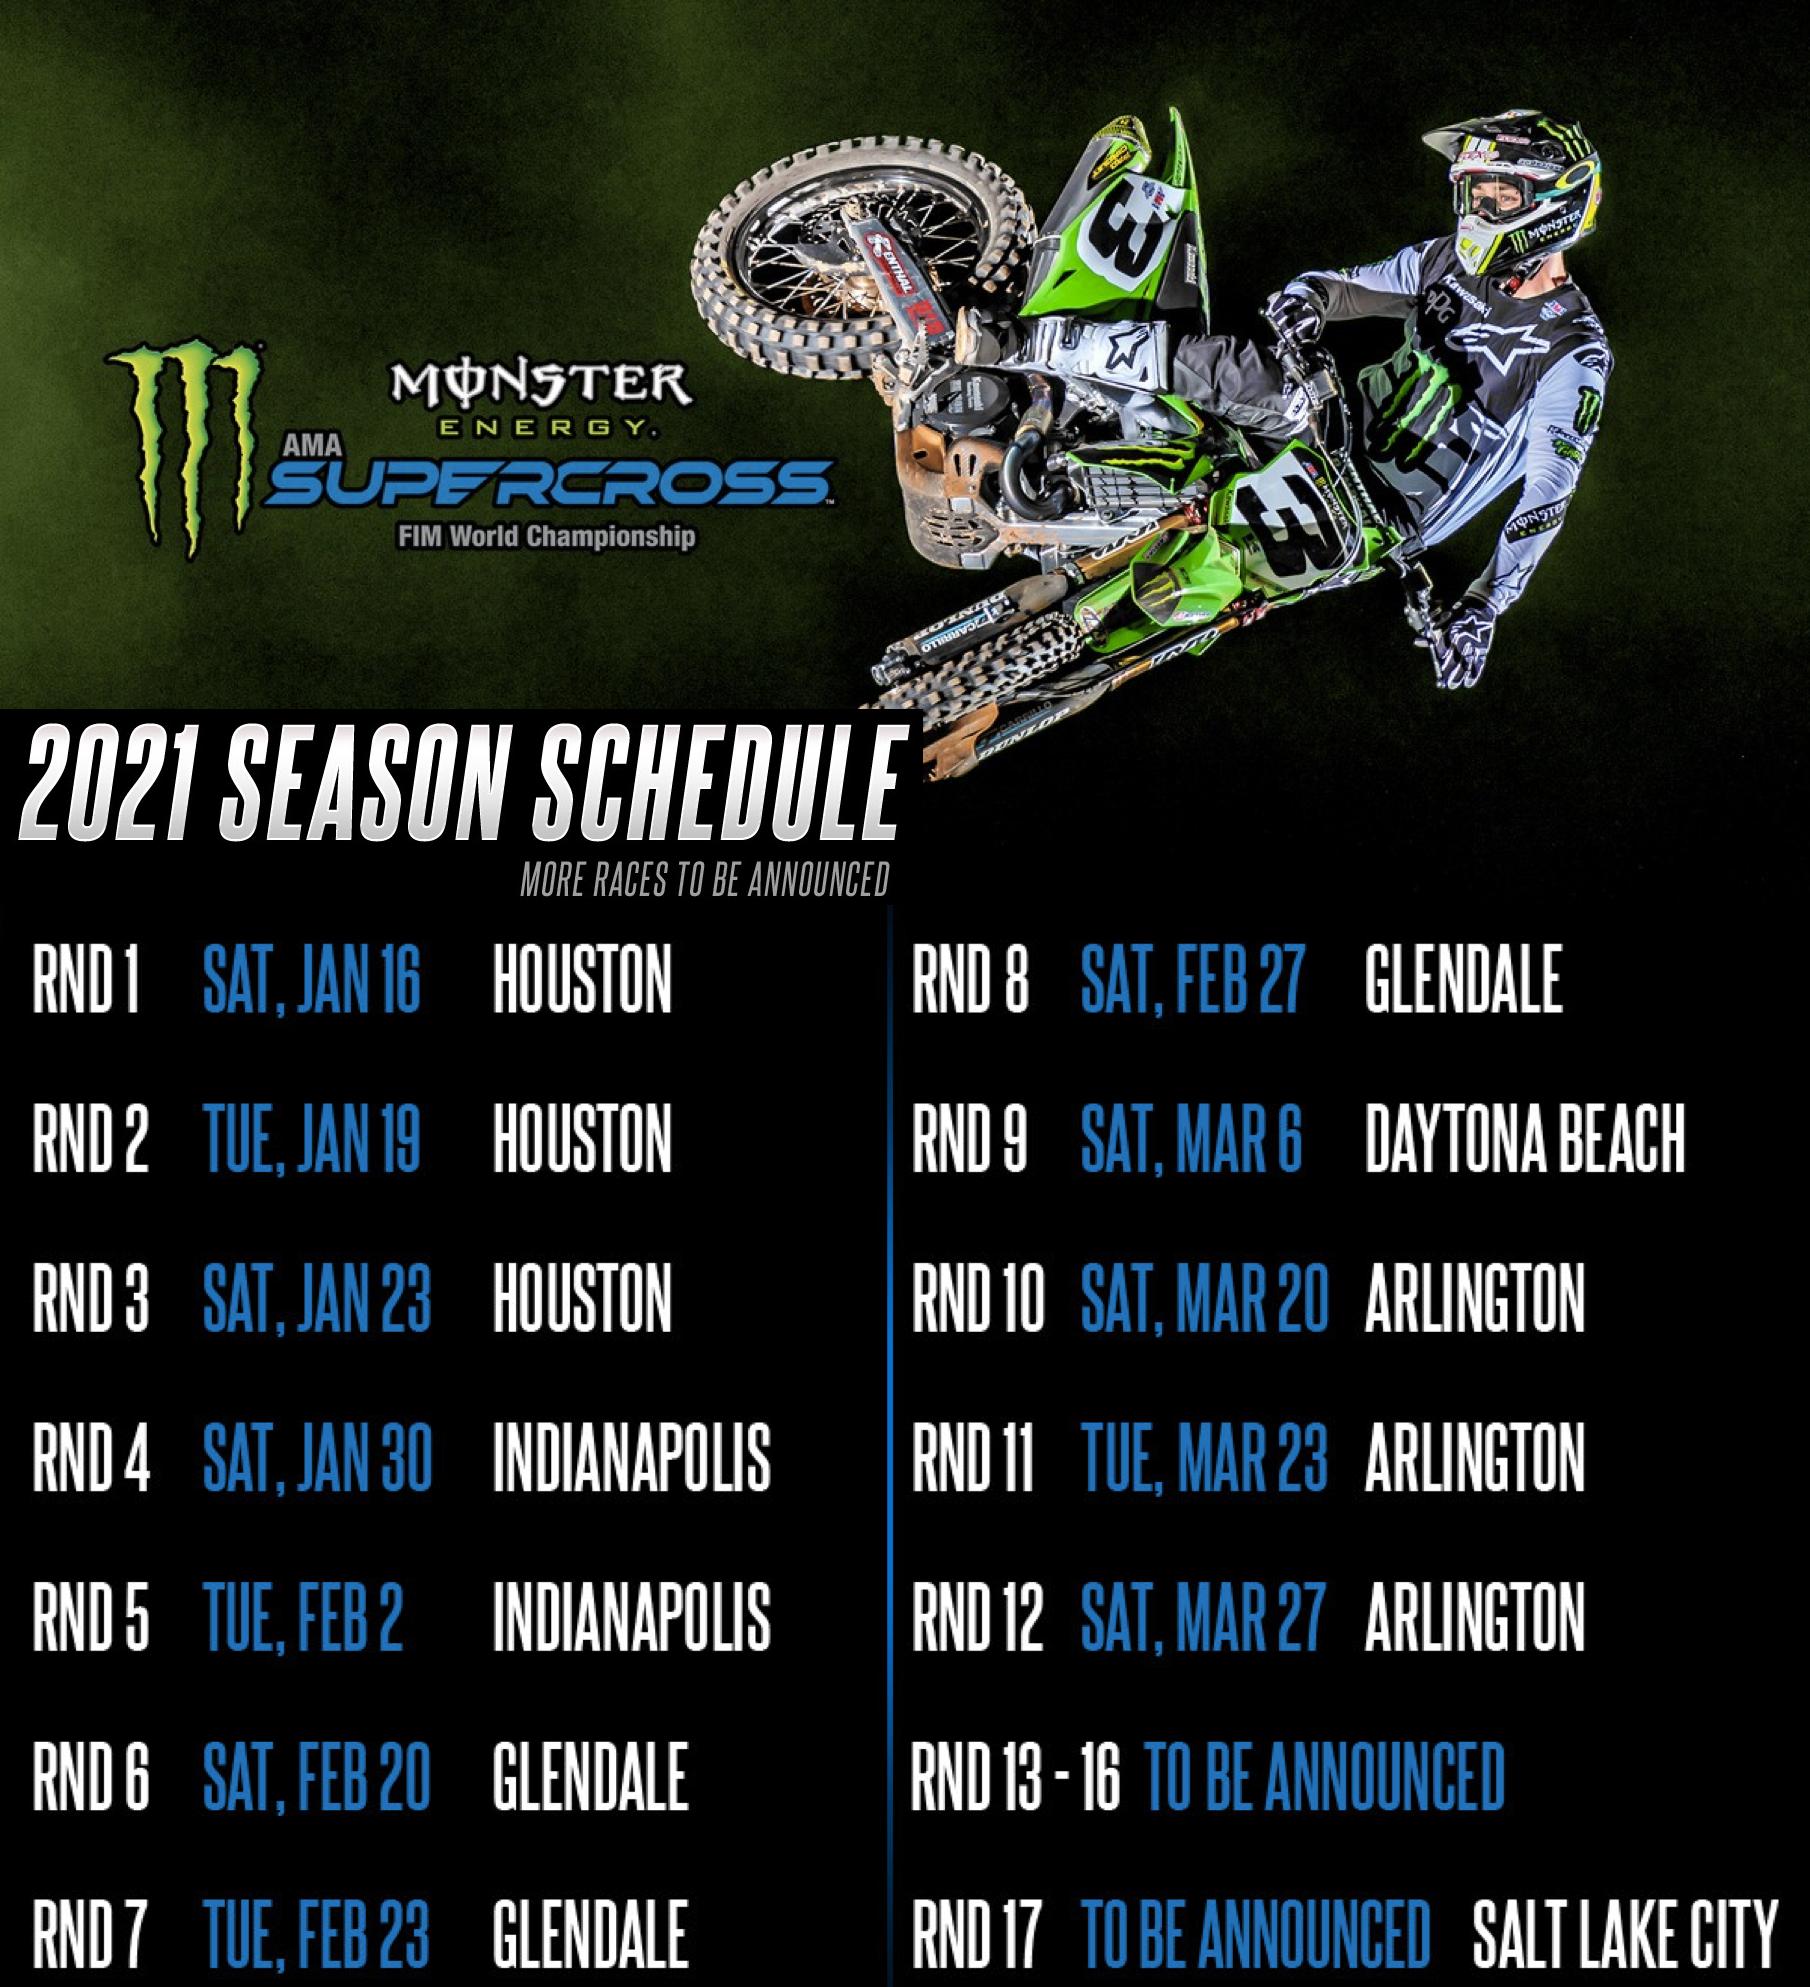 2021 AMA Supercross Calendar